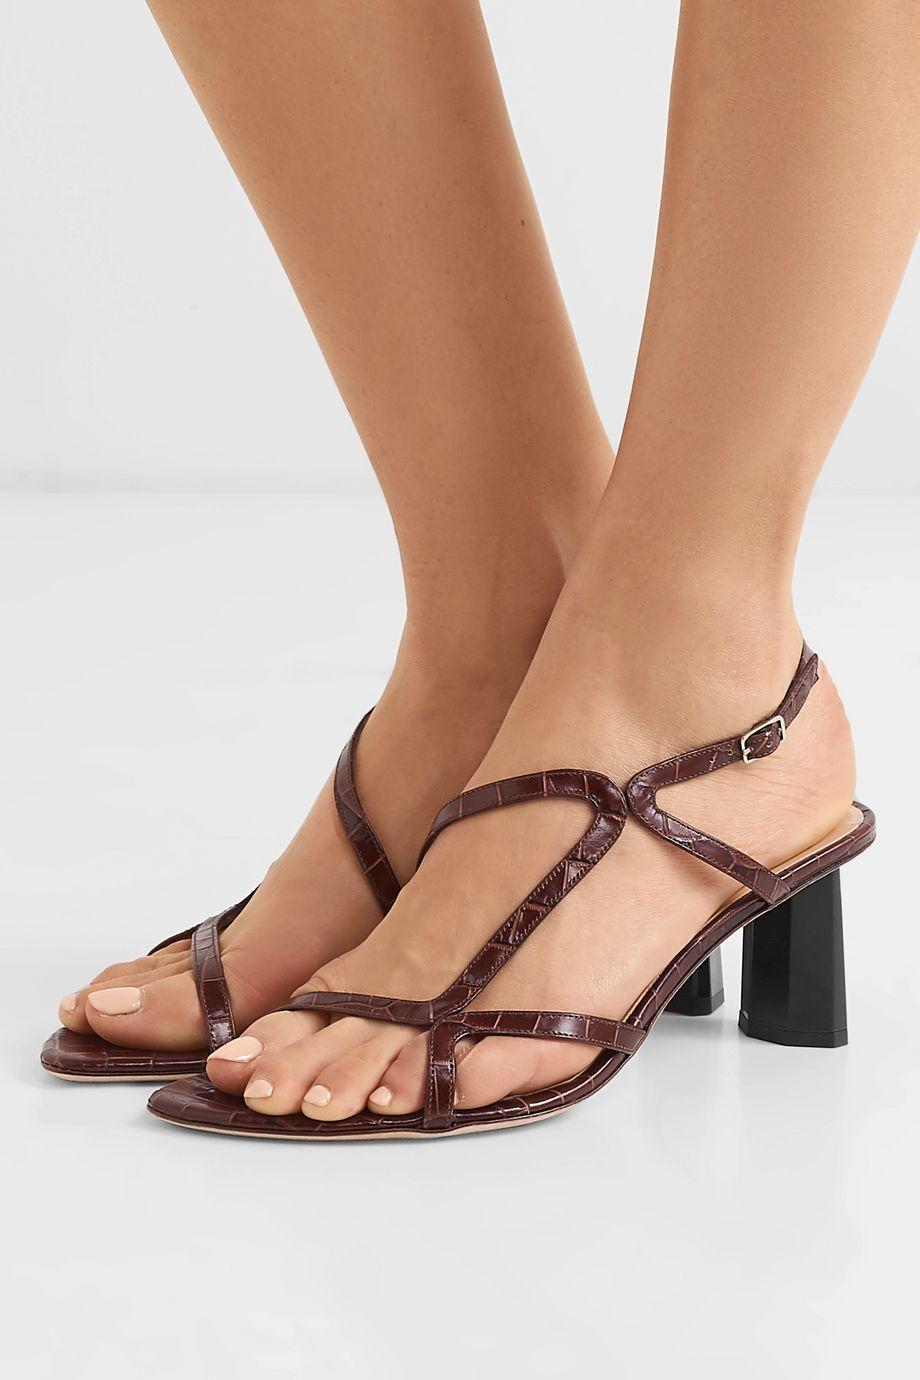 BY FAR Brigette croc-effect leather slingback sandals